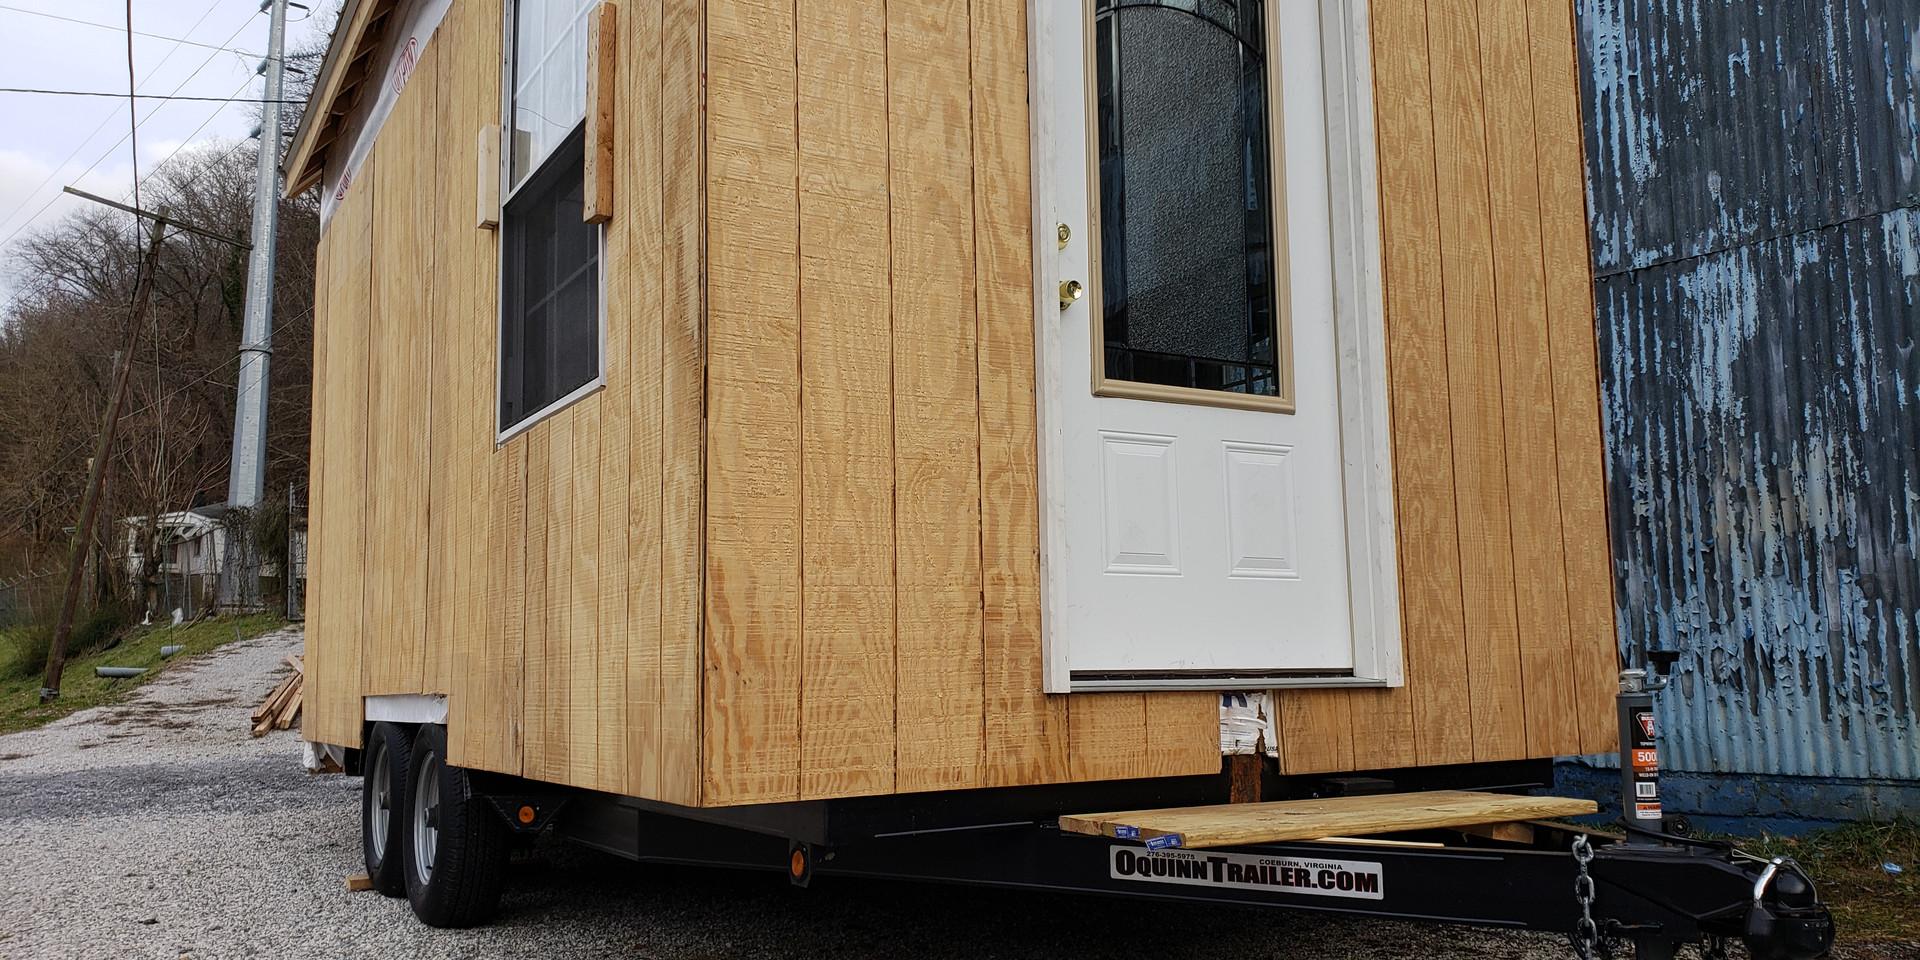 Work-in-progress Tiny House